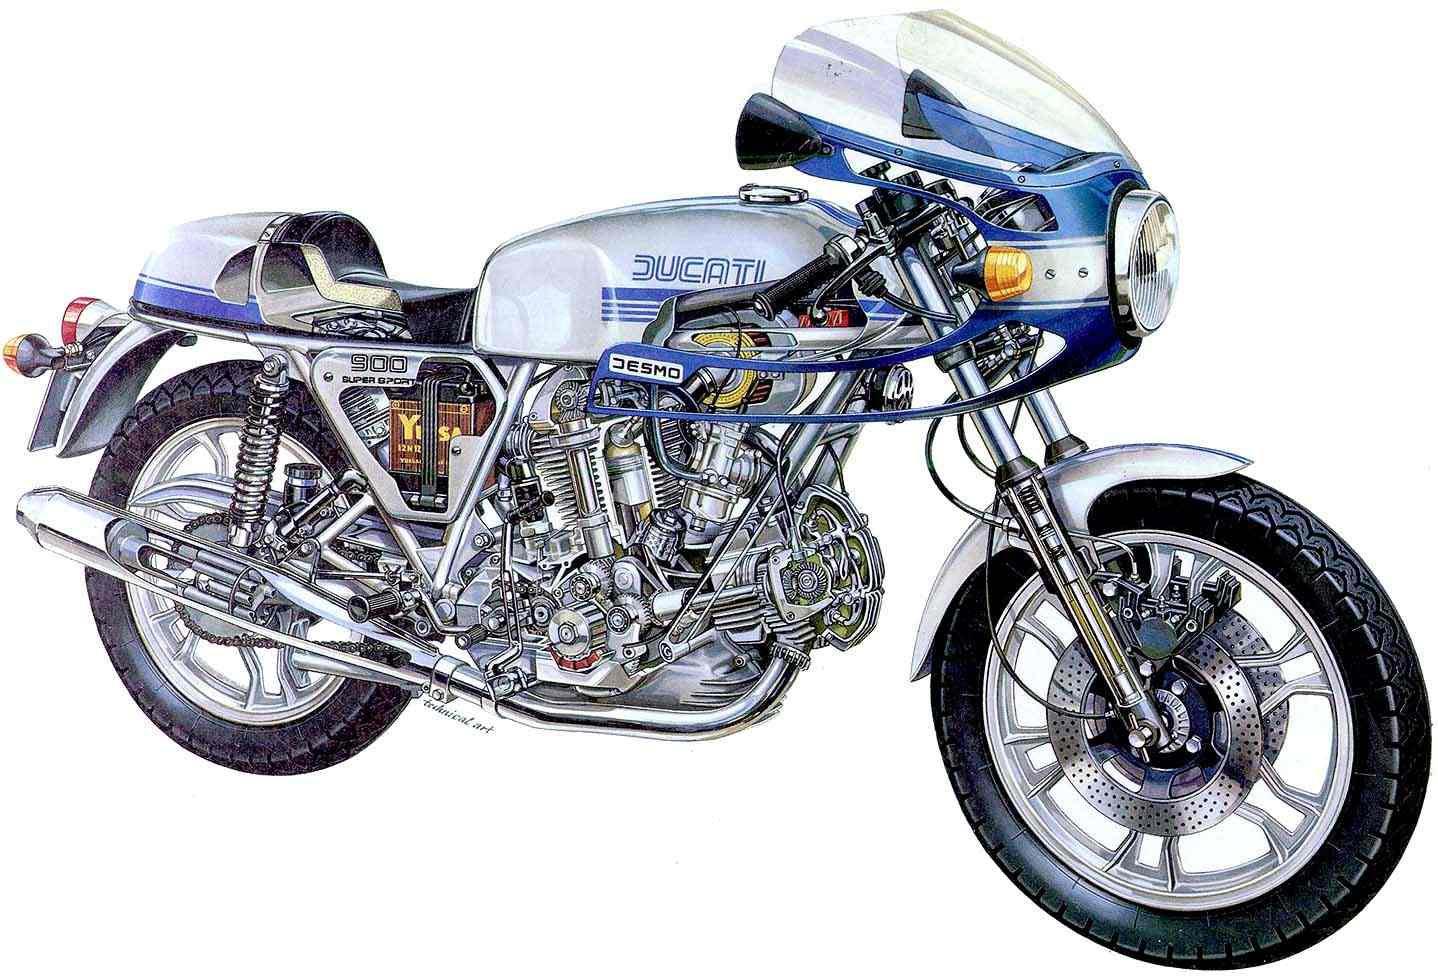 Ducati 900SS cutaway drawing